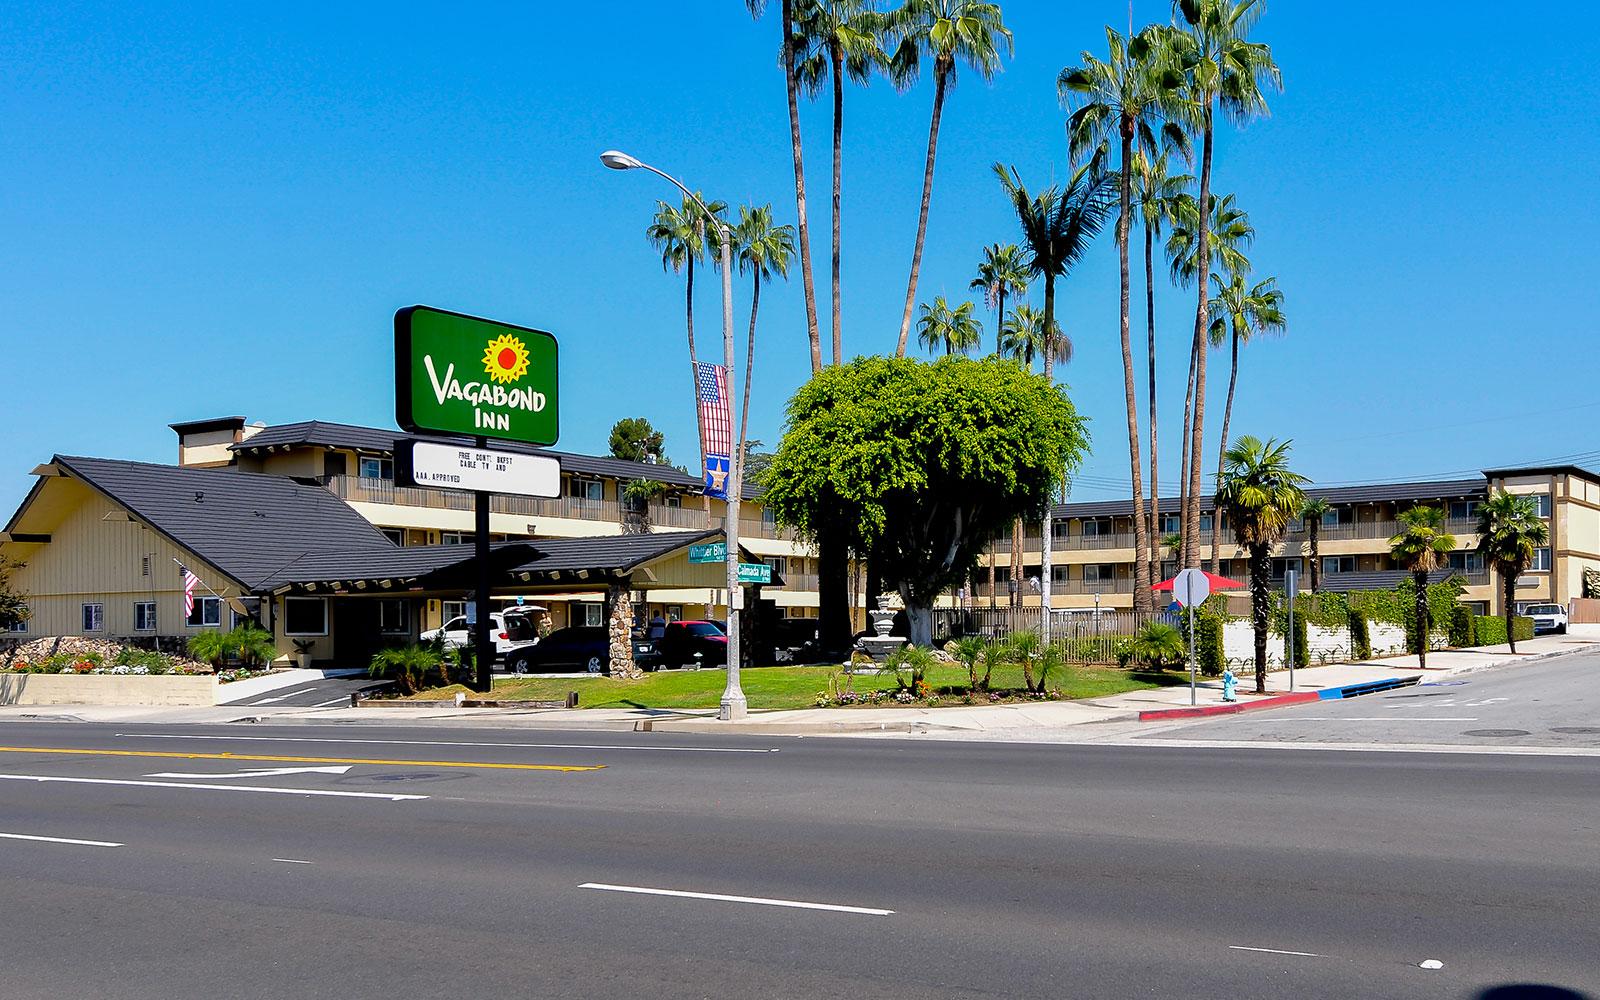 Hotels In Glendale Los Angeles California